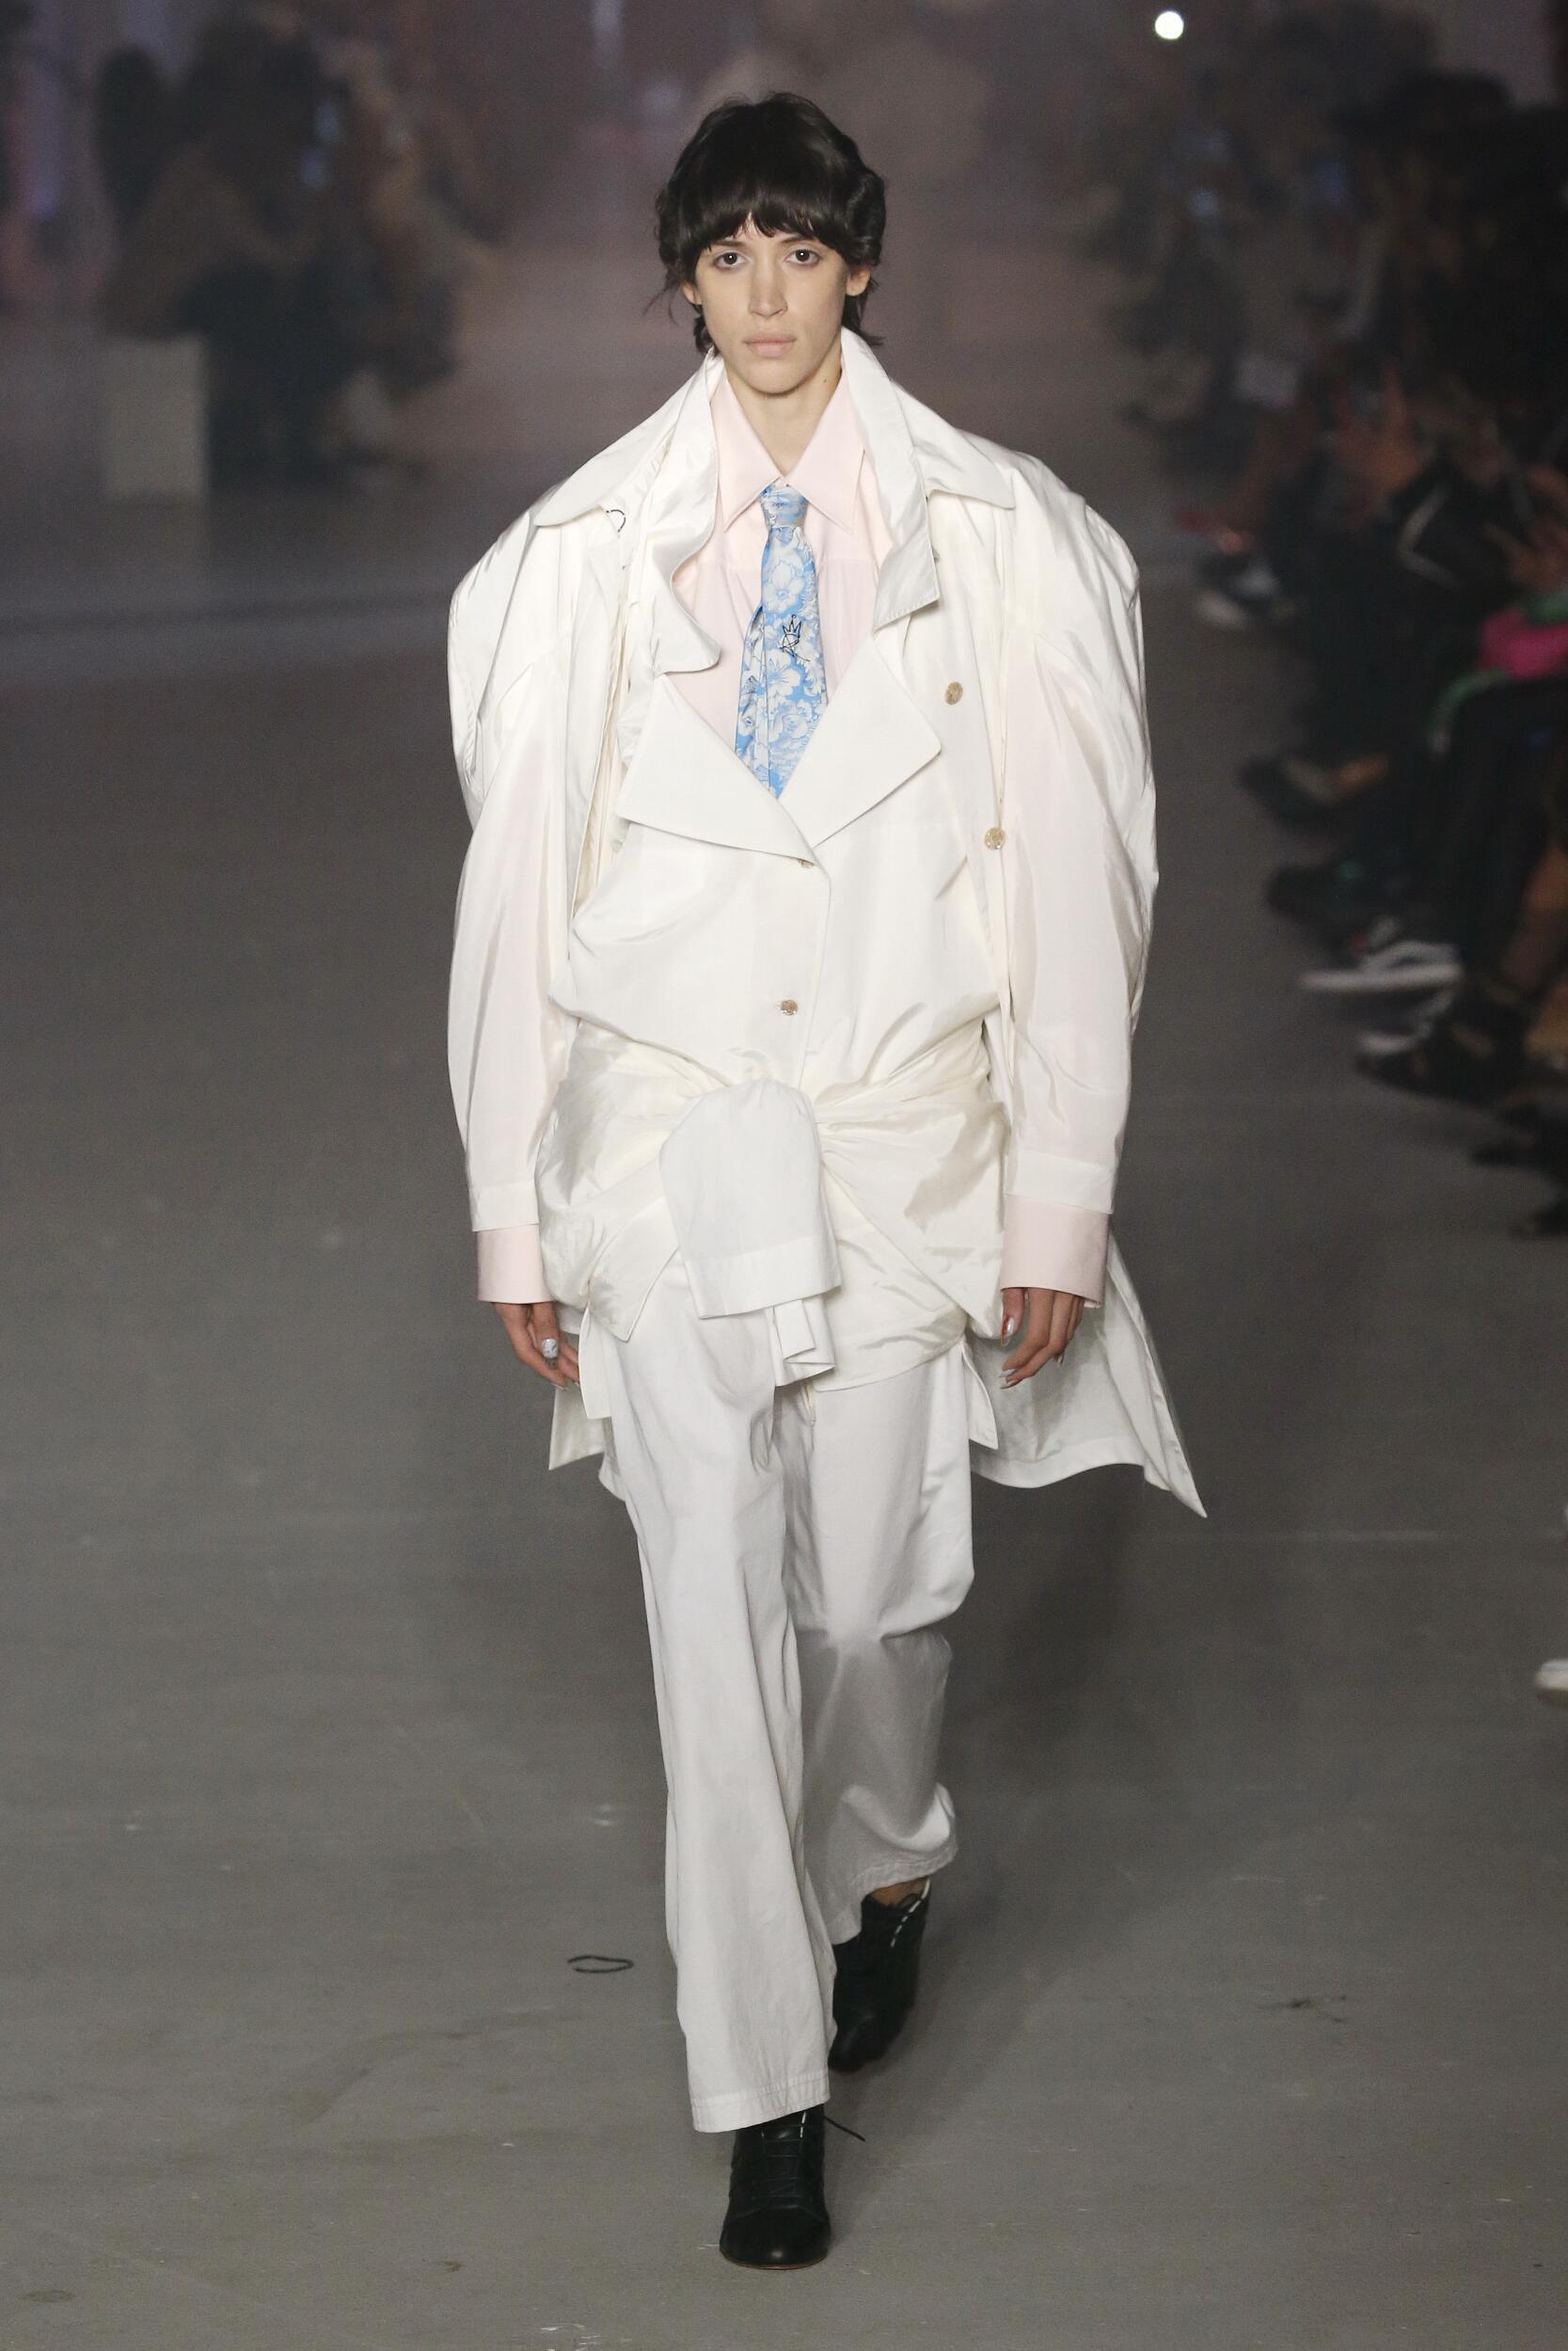 2020 Andreas Kronthaler for Vivienne Westwood Summer Runway Show